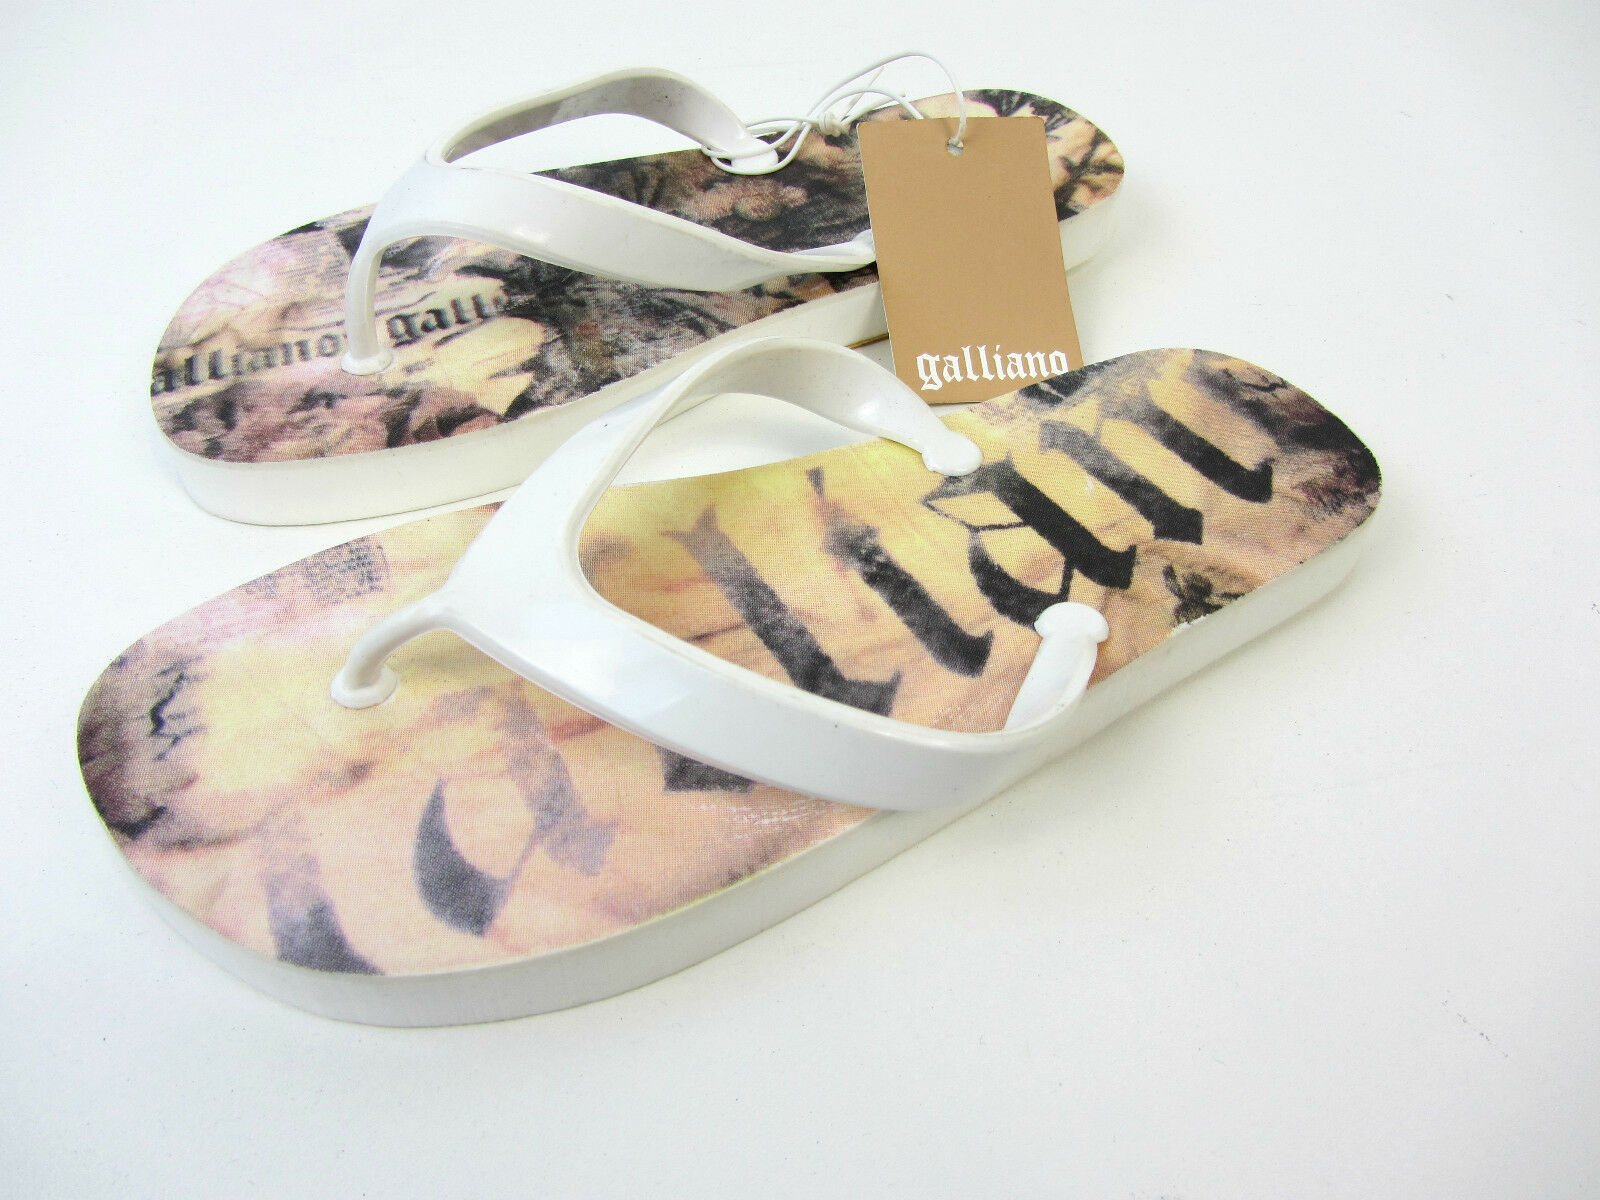 John Galliano Badeschuhe Zehentrenner Schuhe Neu 36 37 40